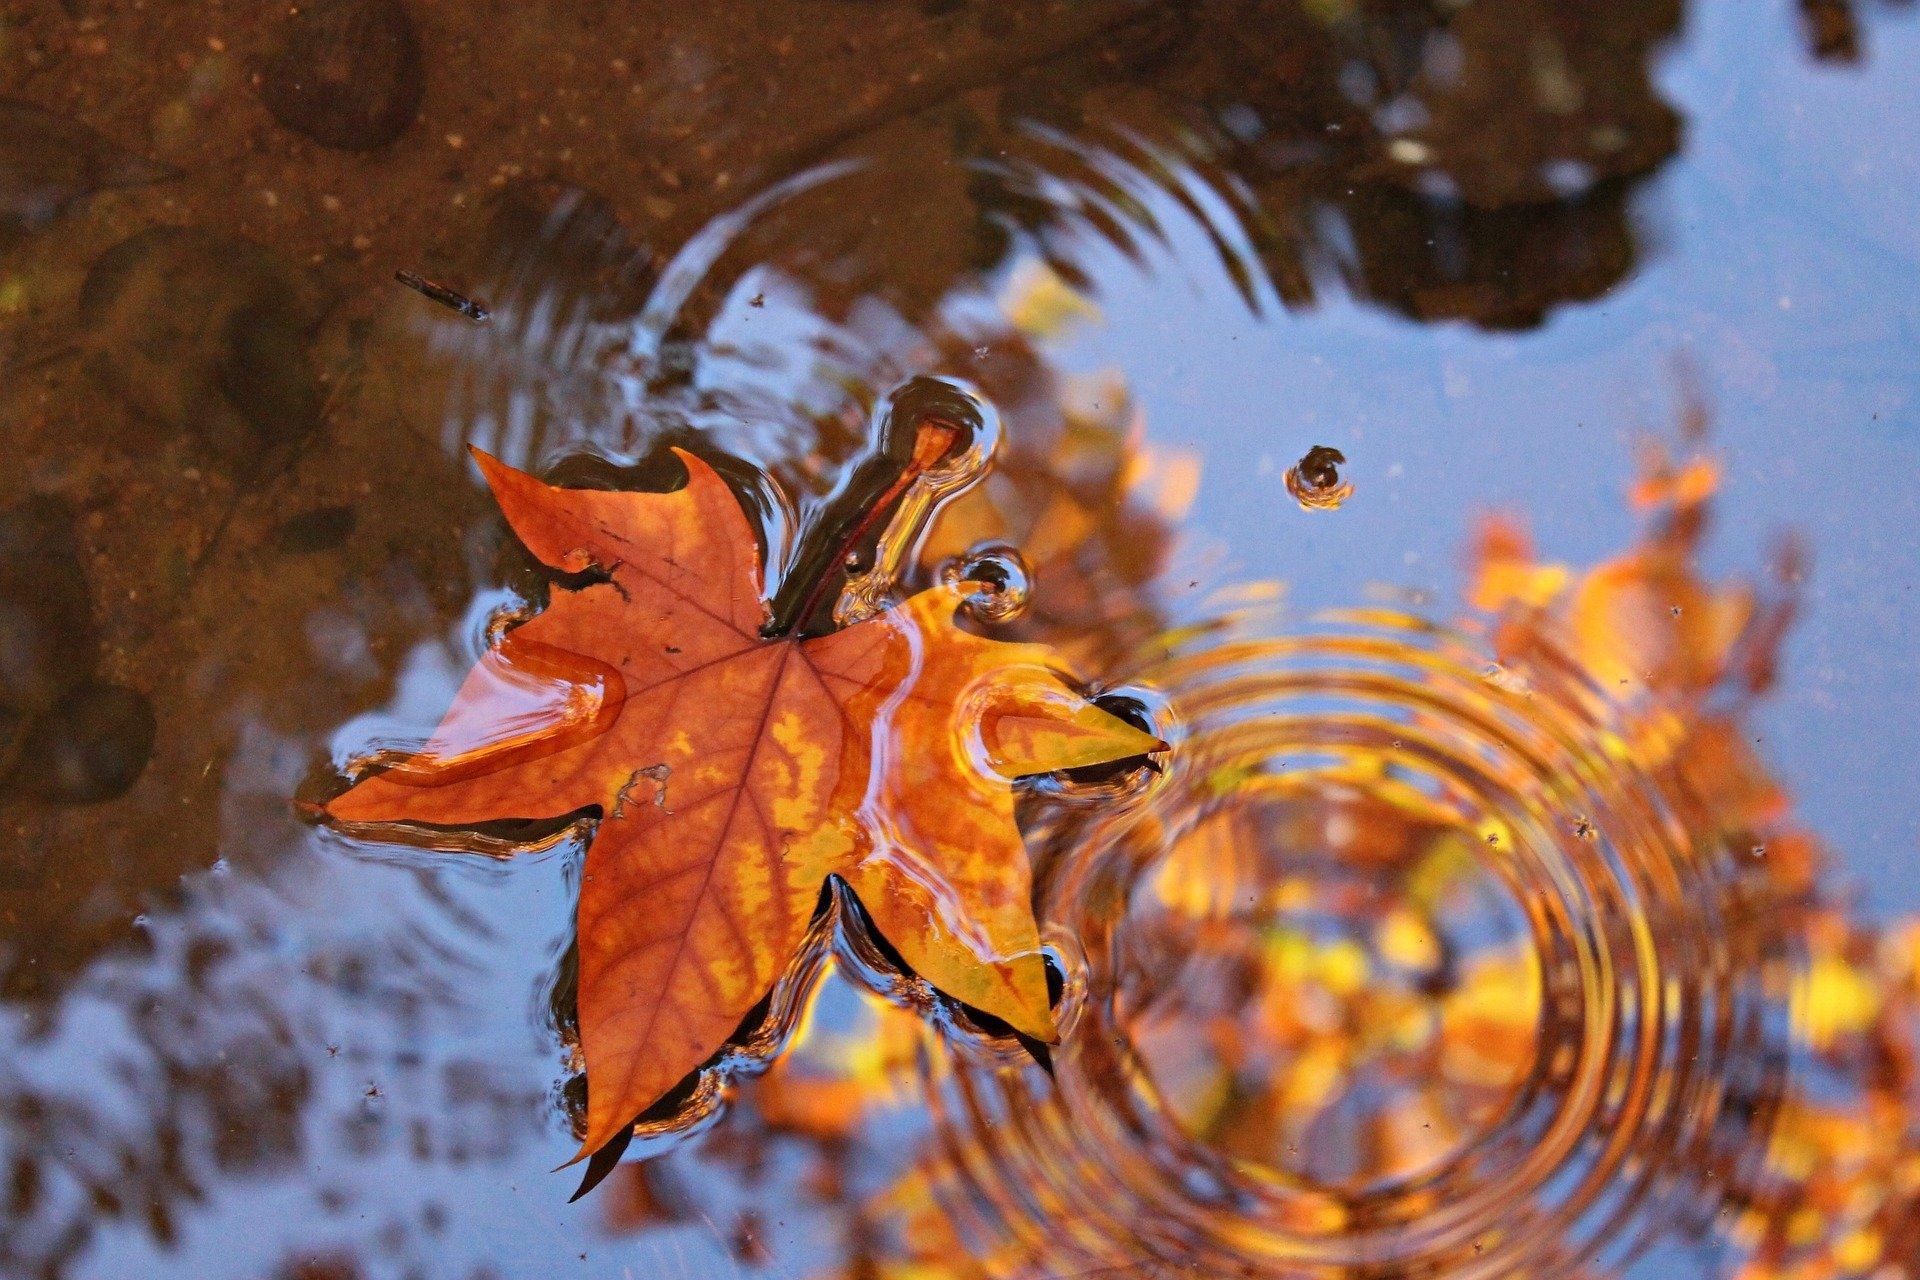 Blatt im Wasser Herbst malubeng Pixabay